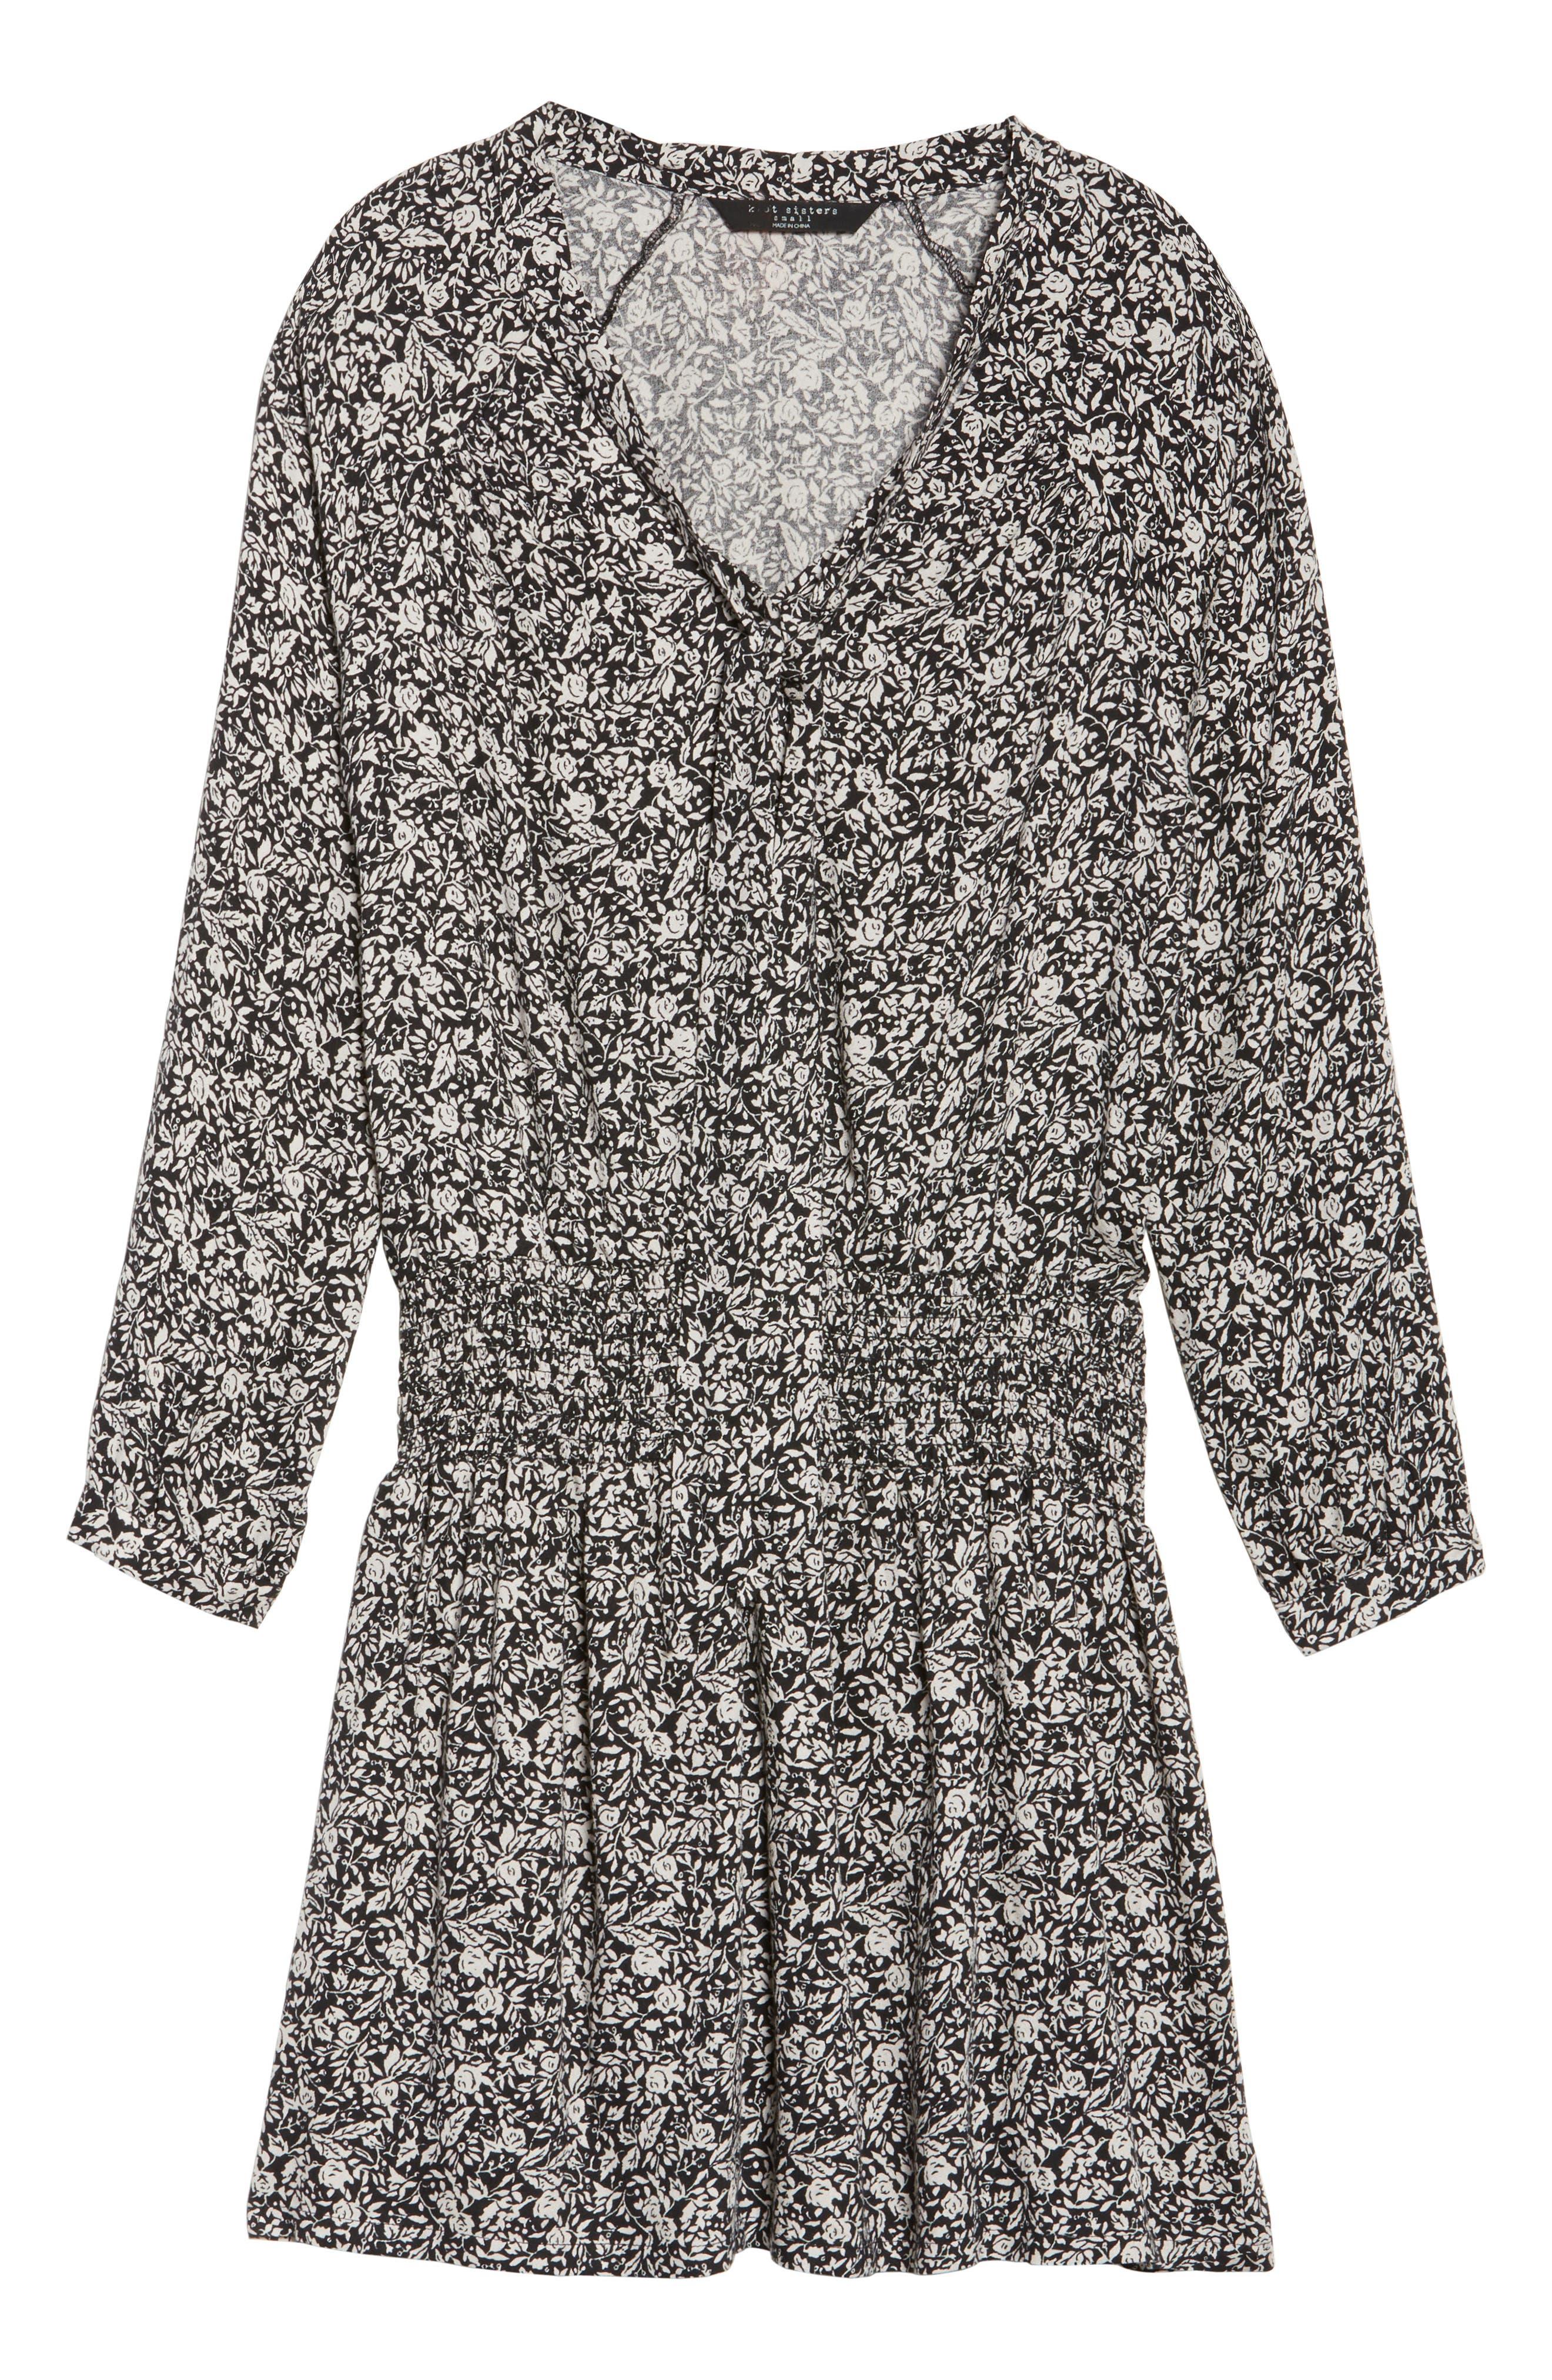 Ivy Blouson Dress,                             Alternate thumbnail 6, color,                             001